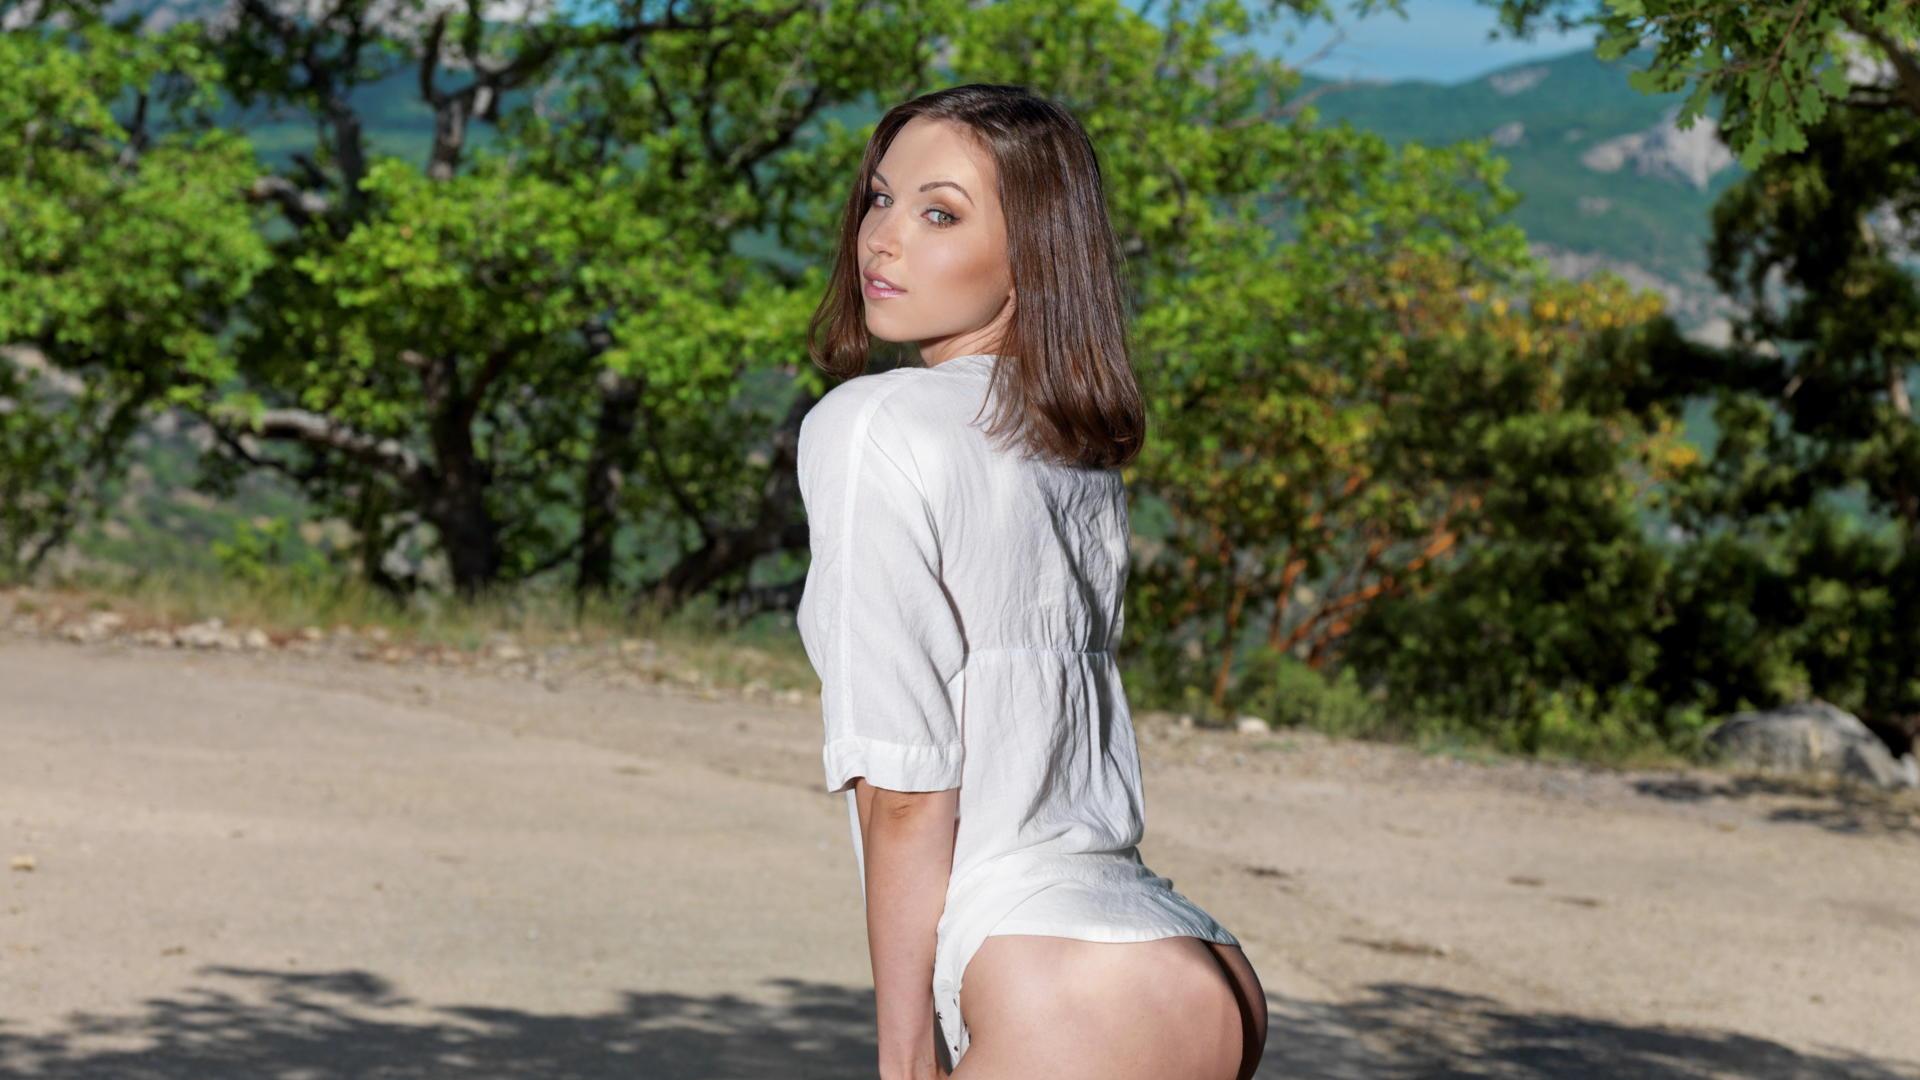 Download photo 1920x1080, anita e, brunette, sexy girl